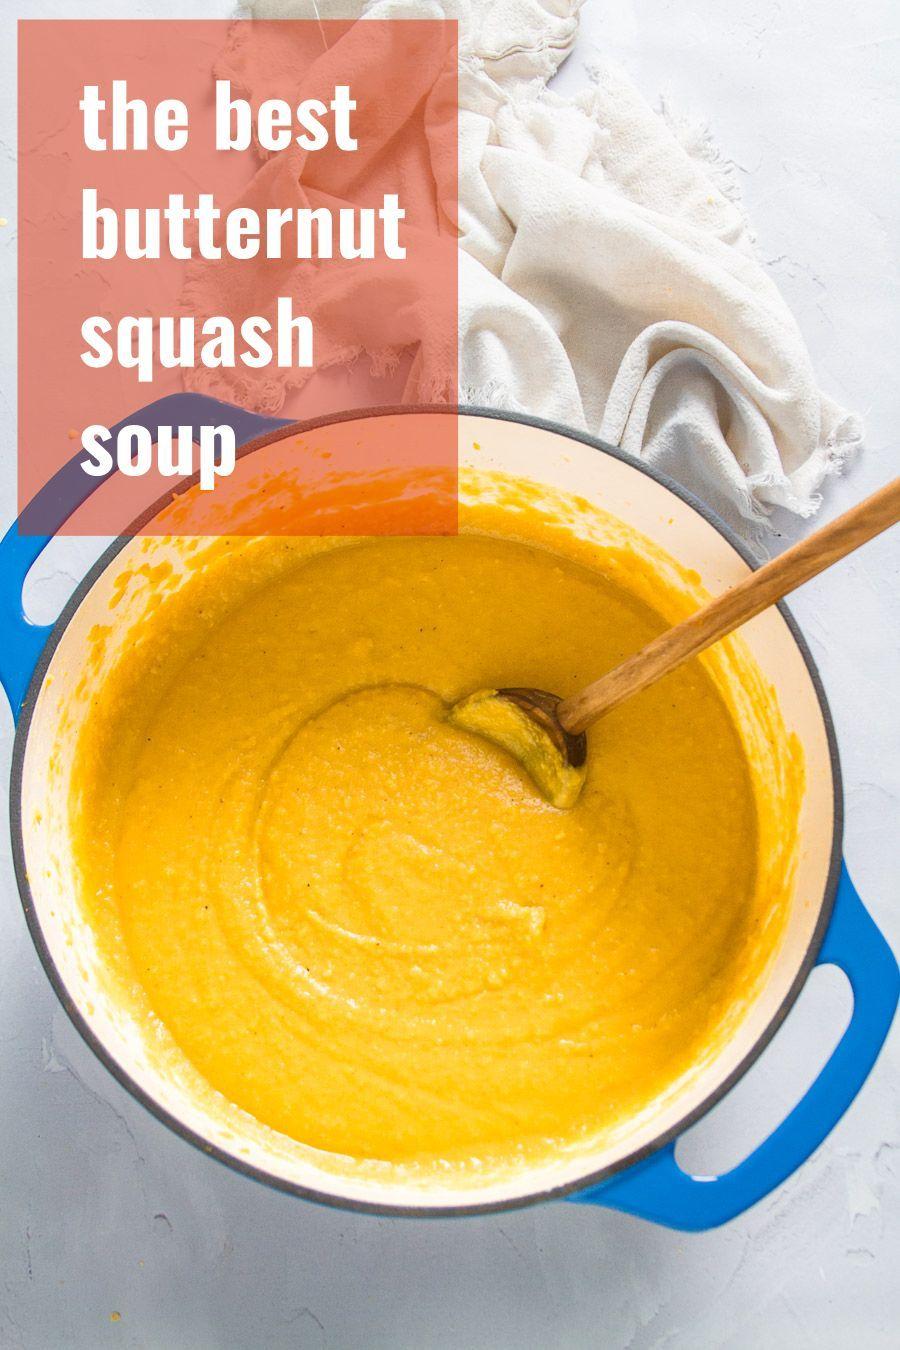 The Best Butternut Squash Soup